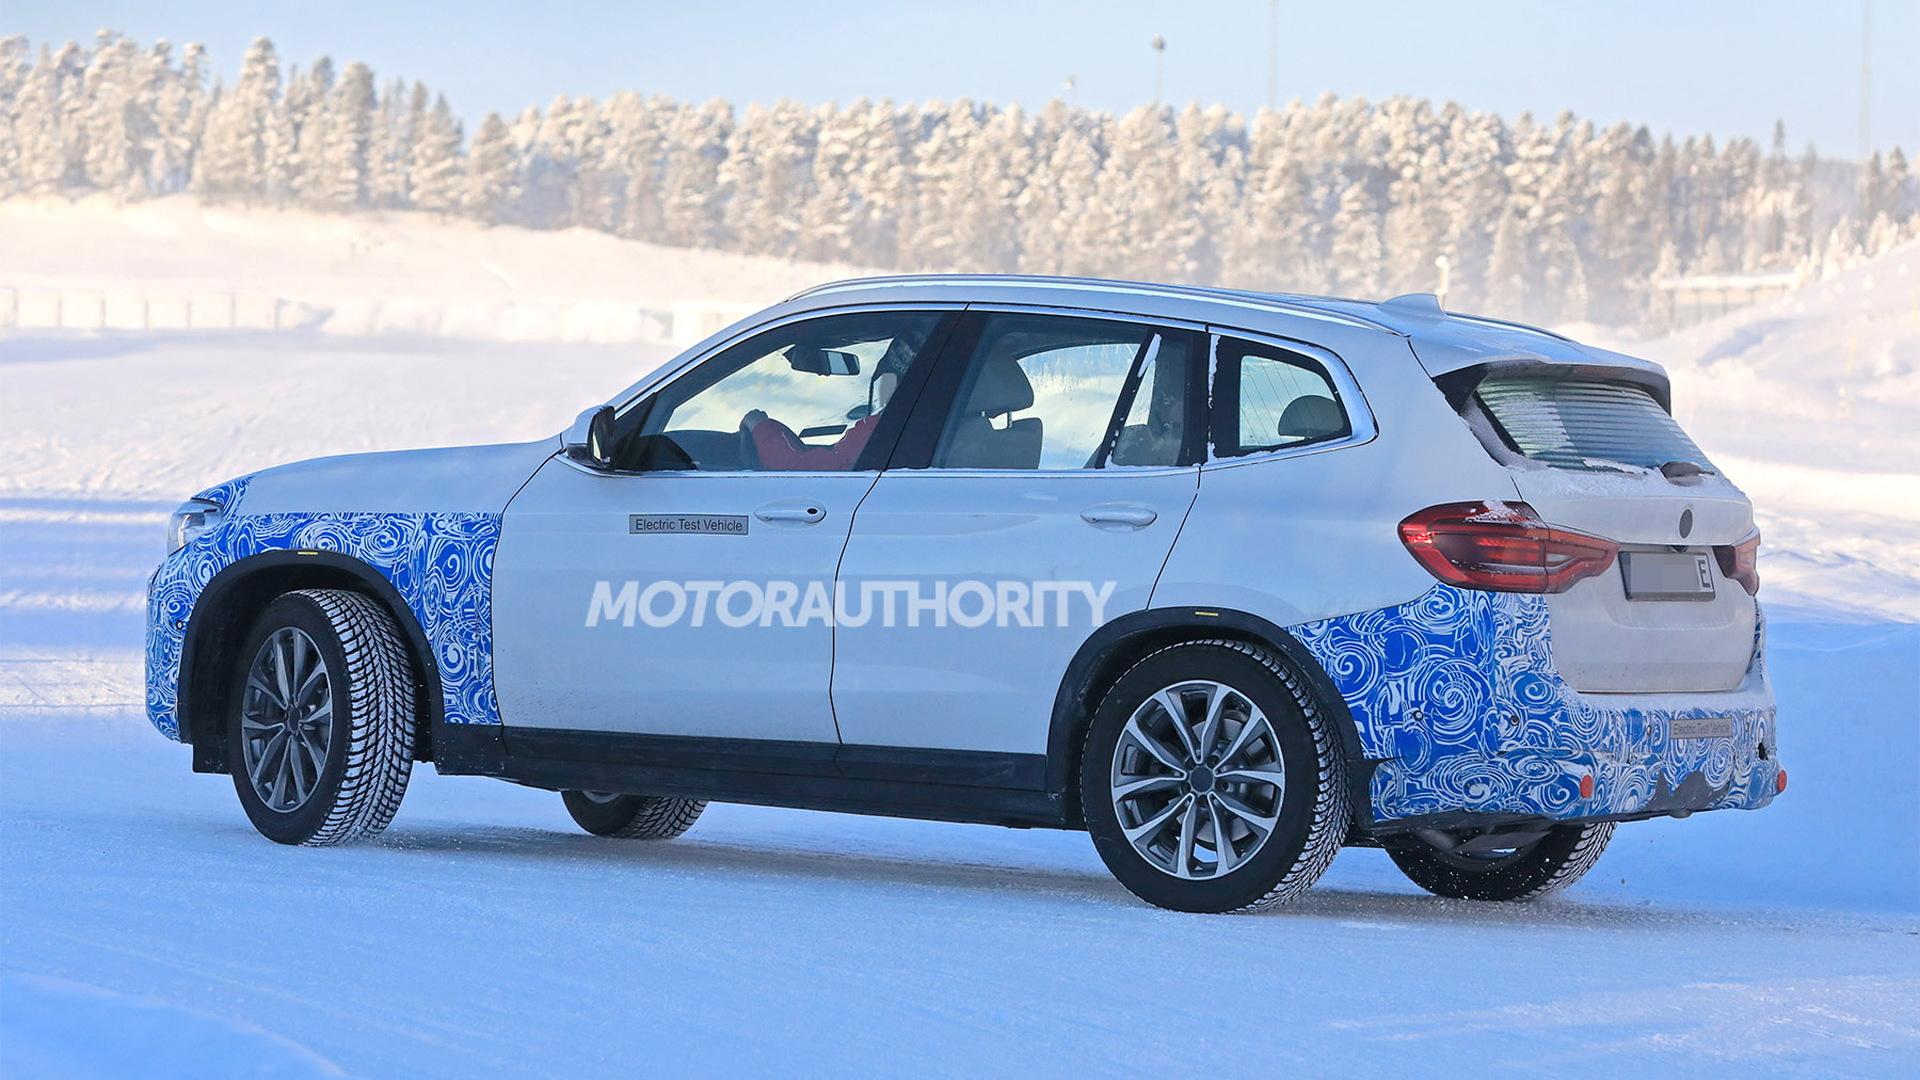 2021 BMW iX3 spy shots - Image via S. Baldauf/SB-Medien